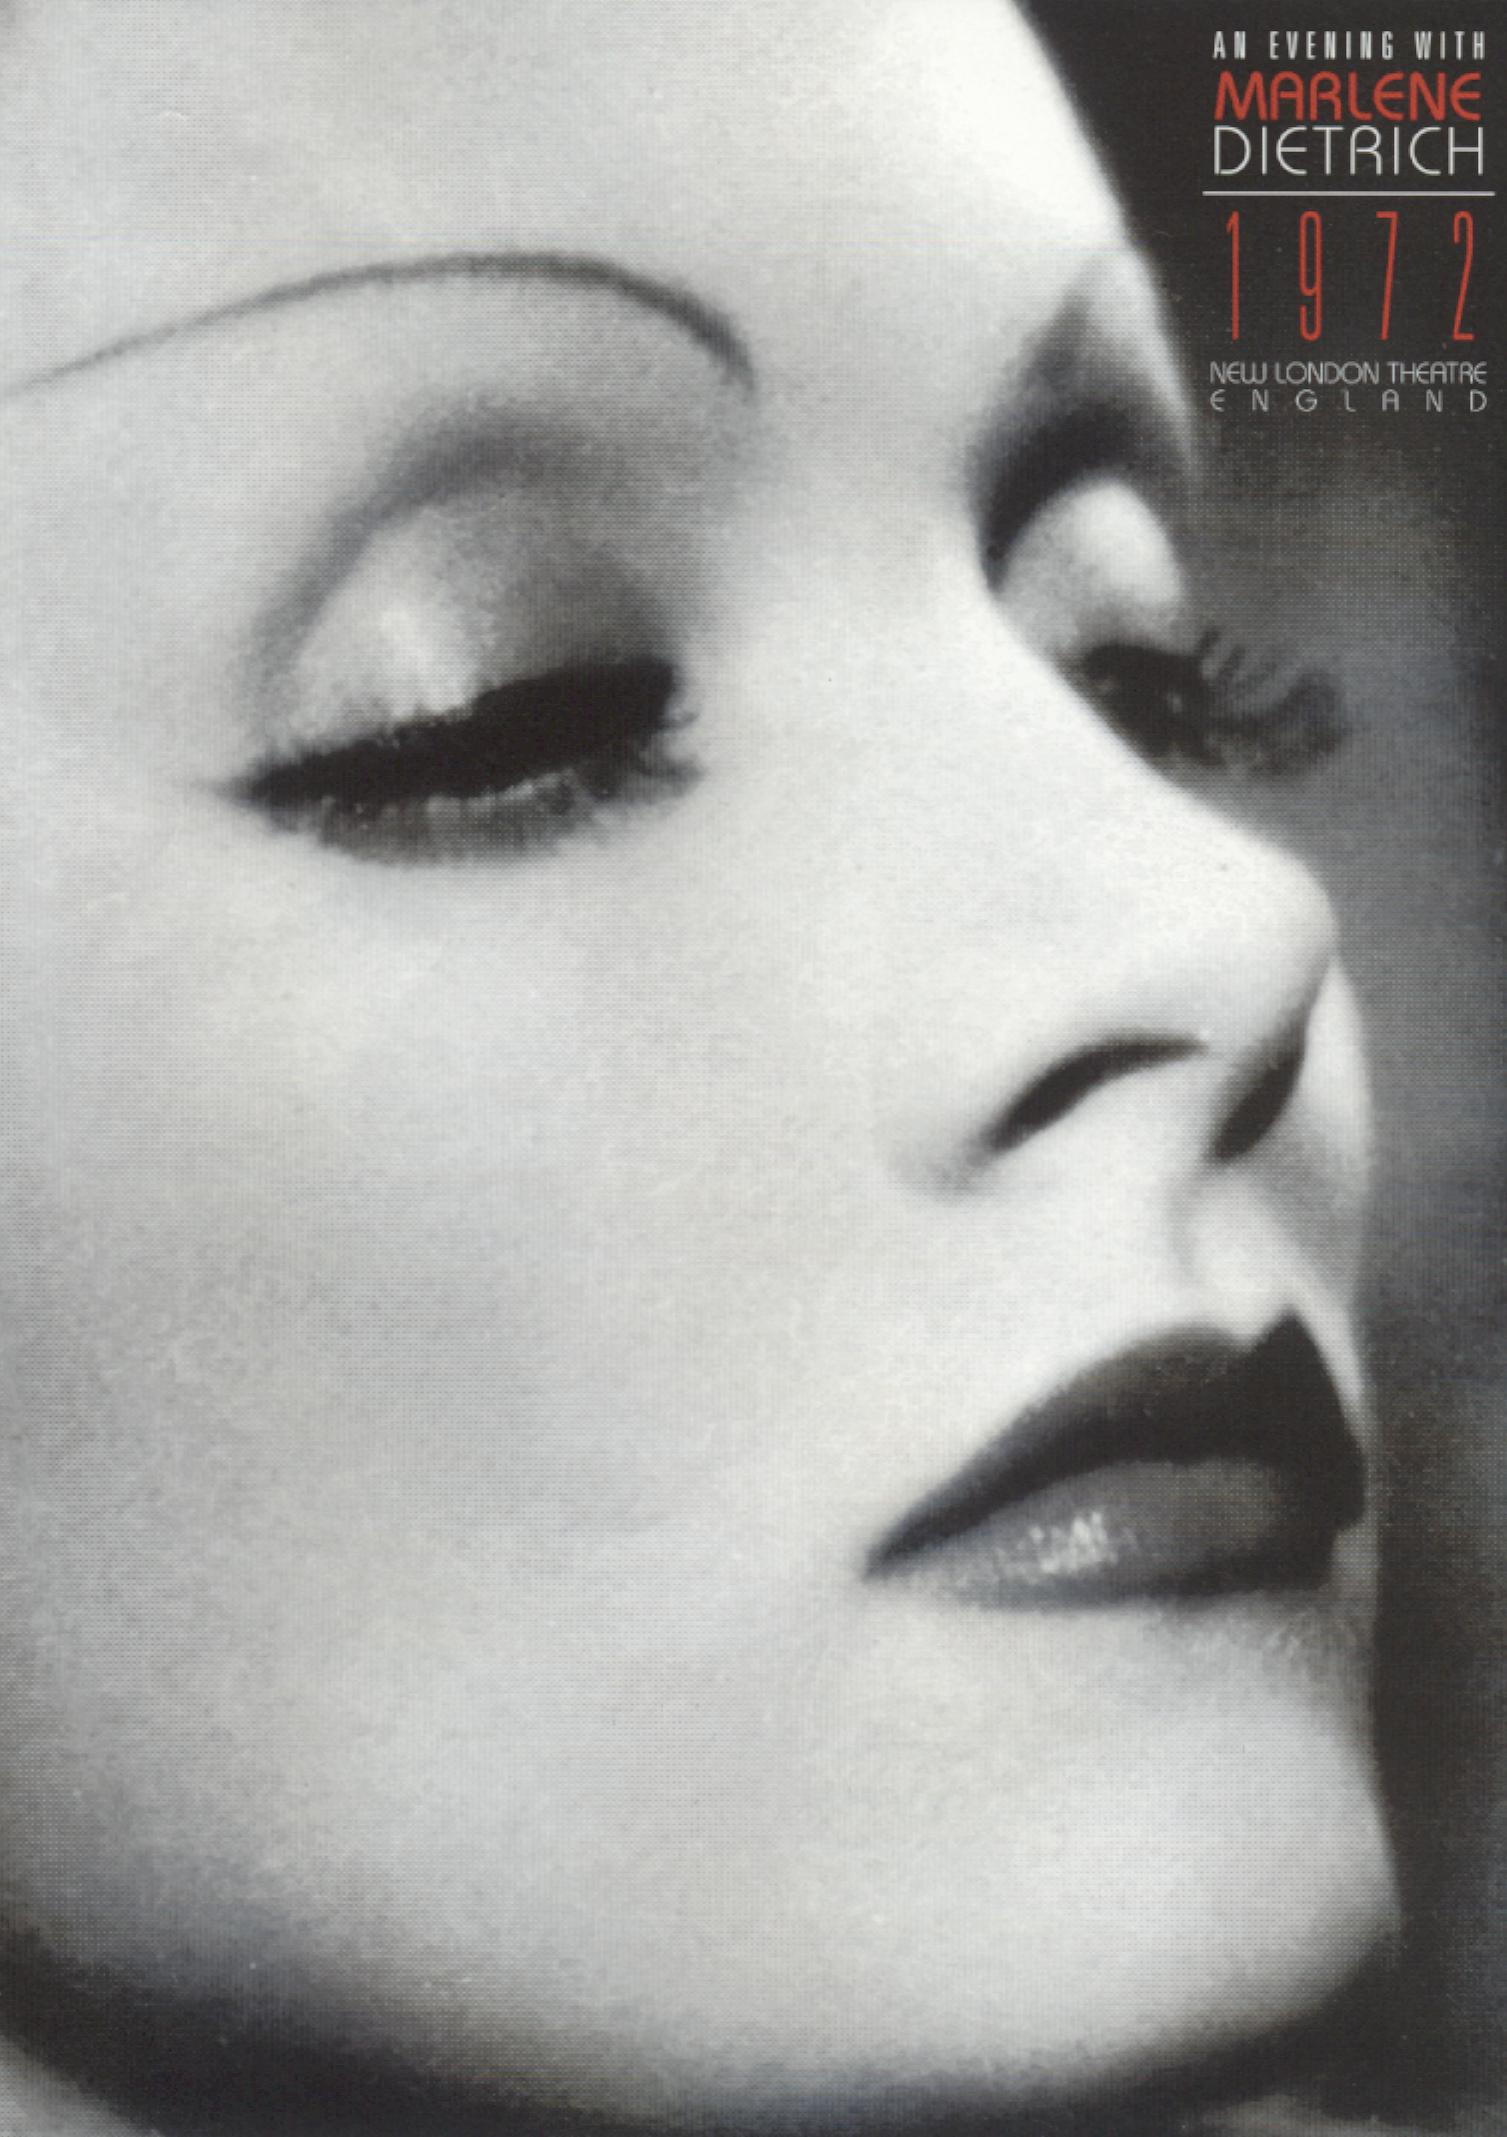 An Evening with Marlene Dietrich